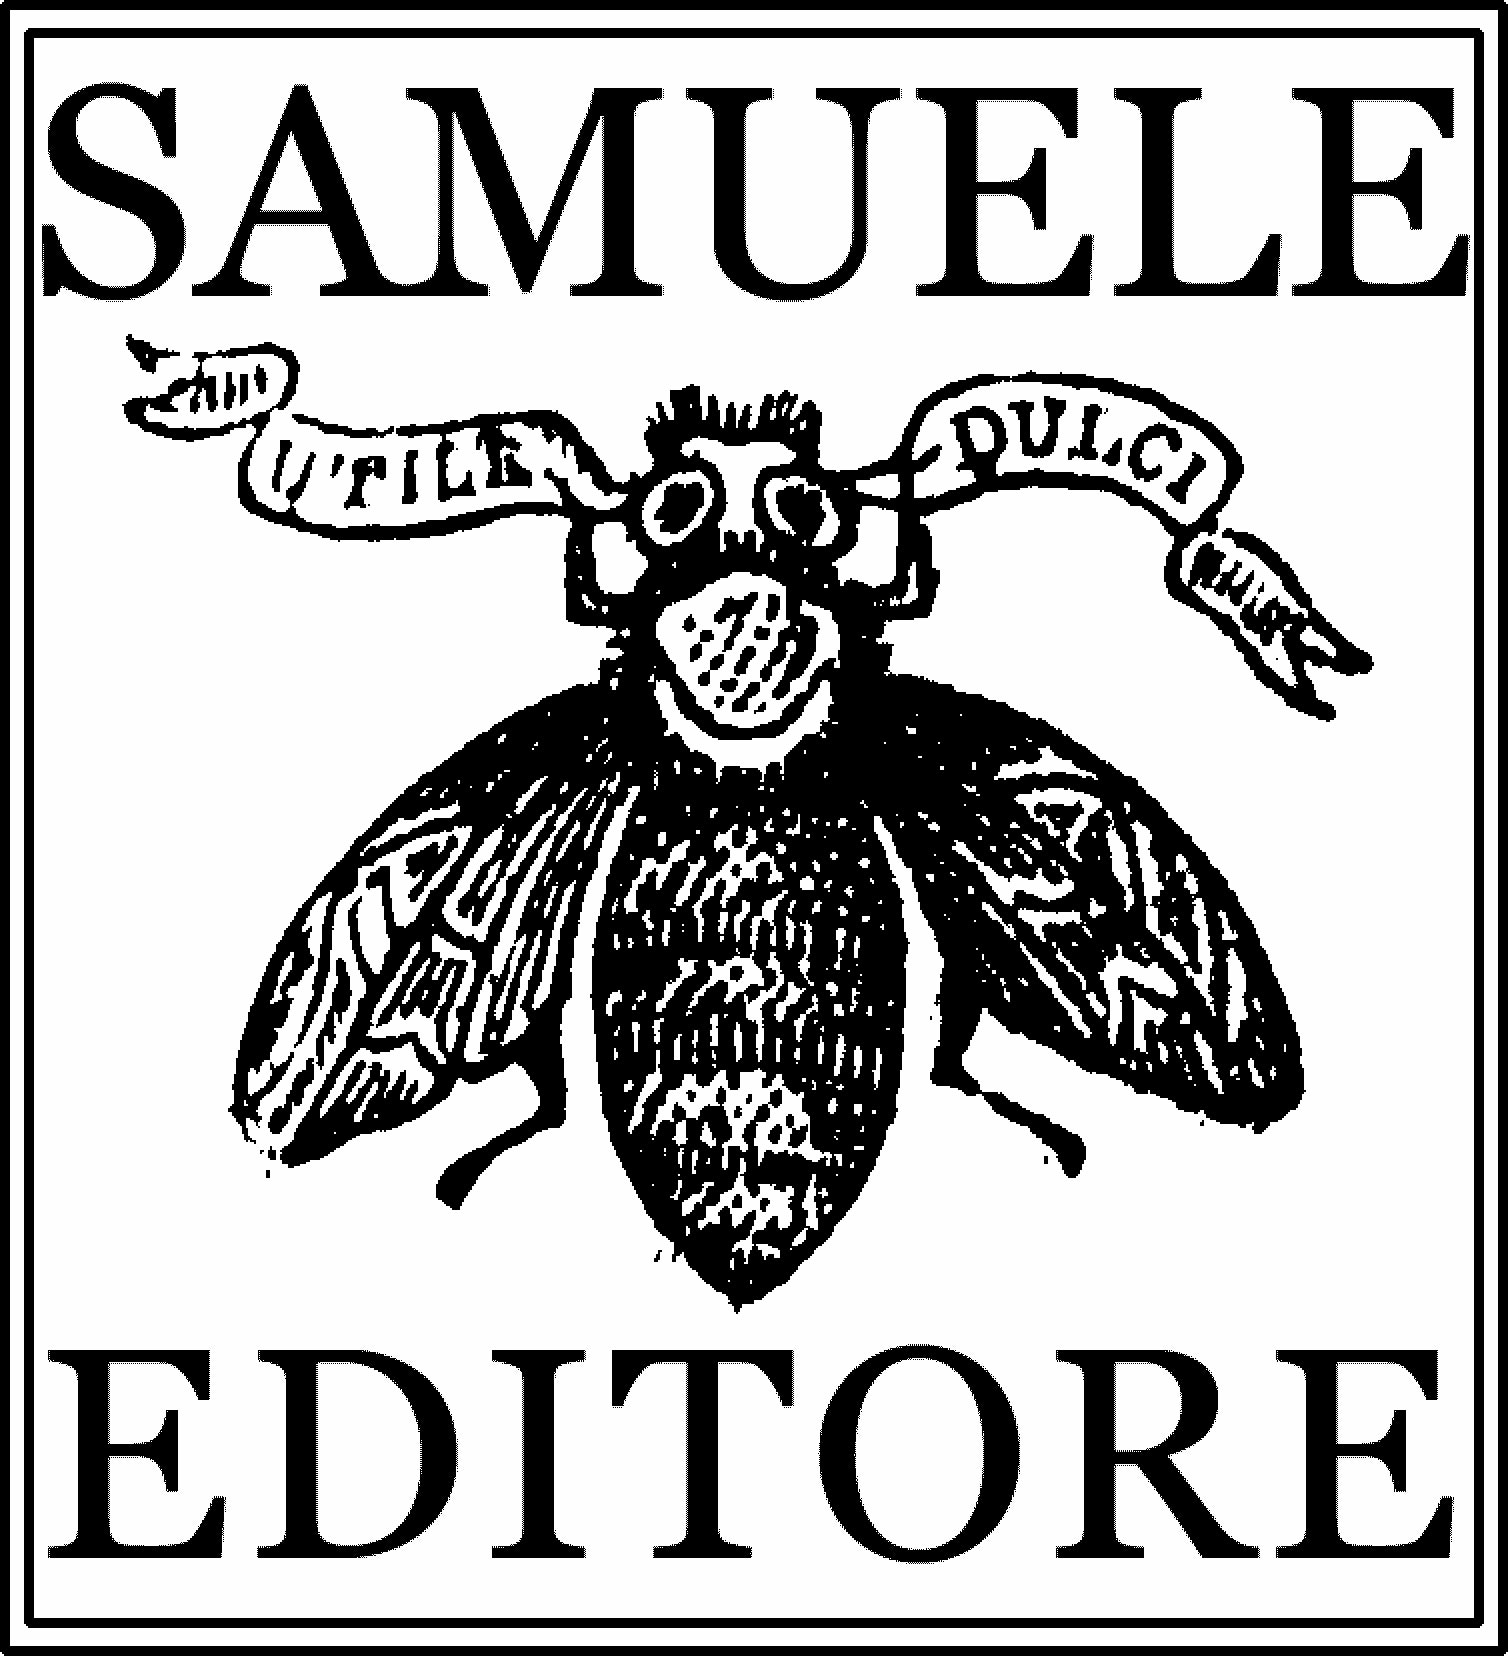 1453472456134187 logo samuele editore